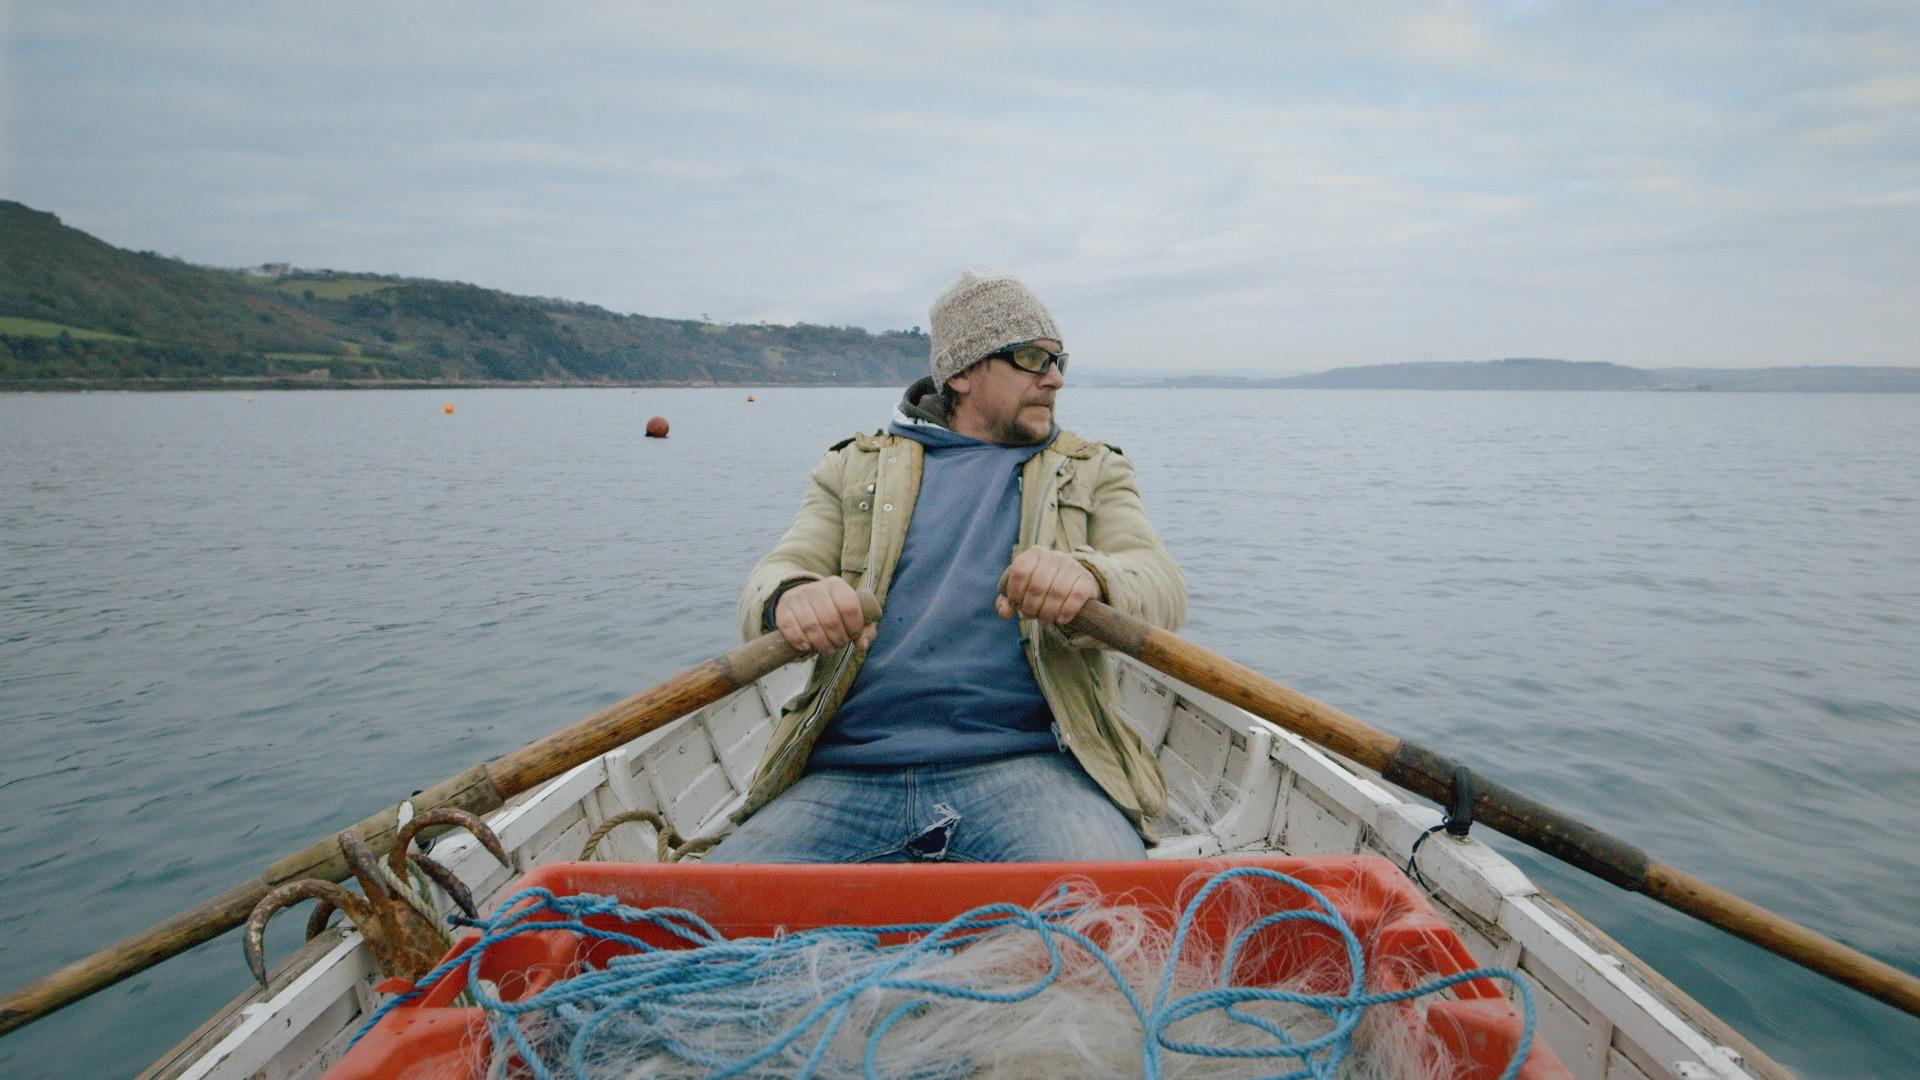 Leo fishing in Cawsand Bay